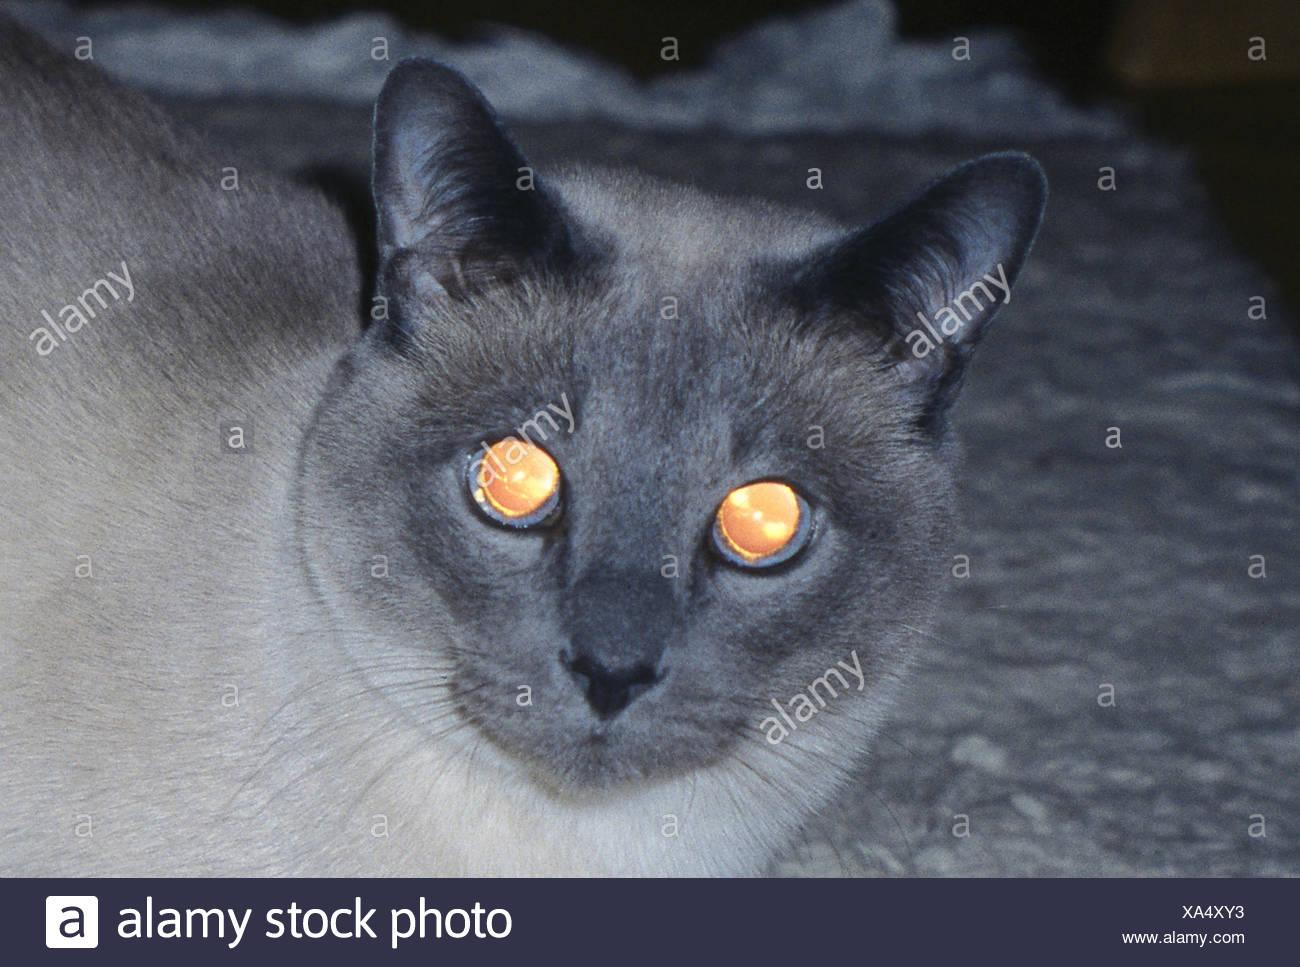 Cats, Tonkanese, darkness, eyes, detail, shine, reflect, animals, mammals, mammal, pets, house cats, portrait, cat's portrait, cats, Felidae, race cat, look, head, moments, Siam cat, reflexion, reflectors, night, darkness, shine, - Stock Image